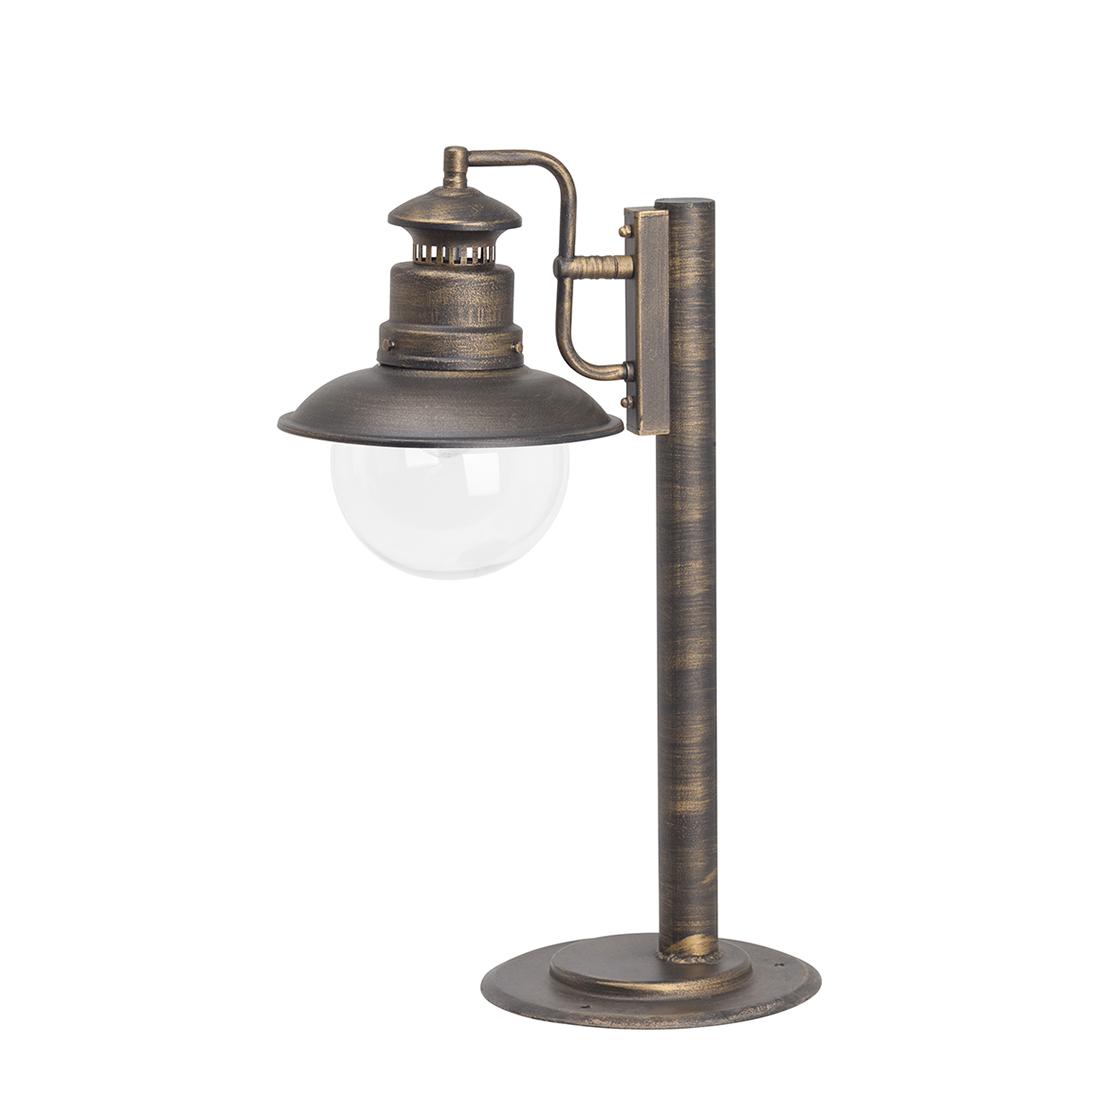 brilliant lampe ext rieure artu 60 w noir or. Black Bedroom Furniture Sets. Home Design Ideas